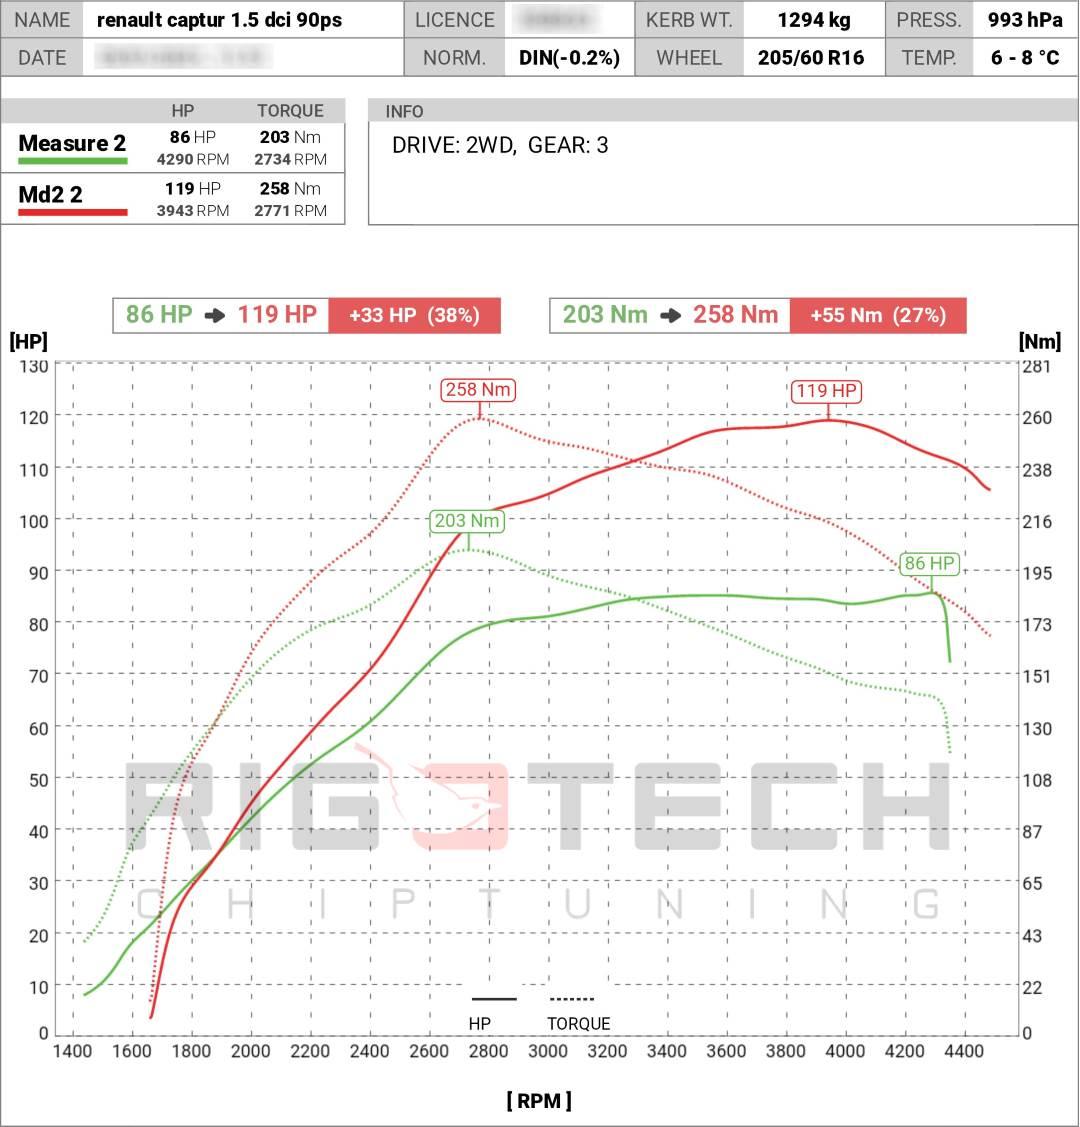 Renault-Captur-15-DCi-90LE-chiptuning-teljesitmenymeres